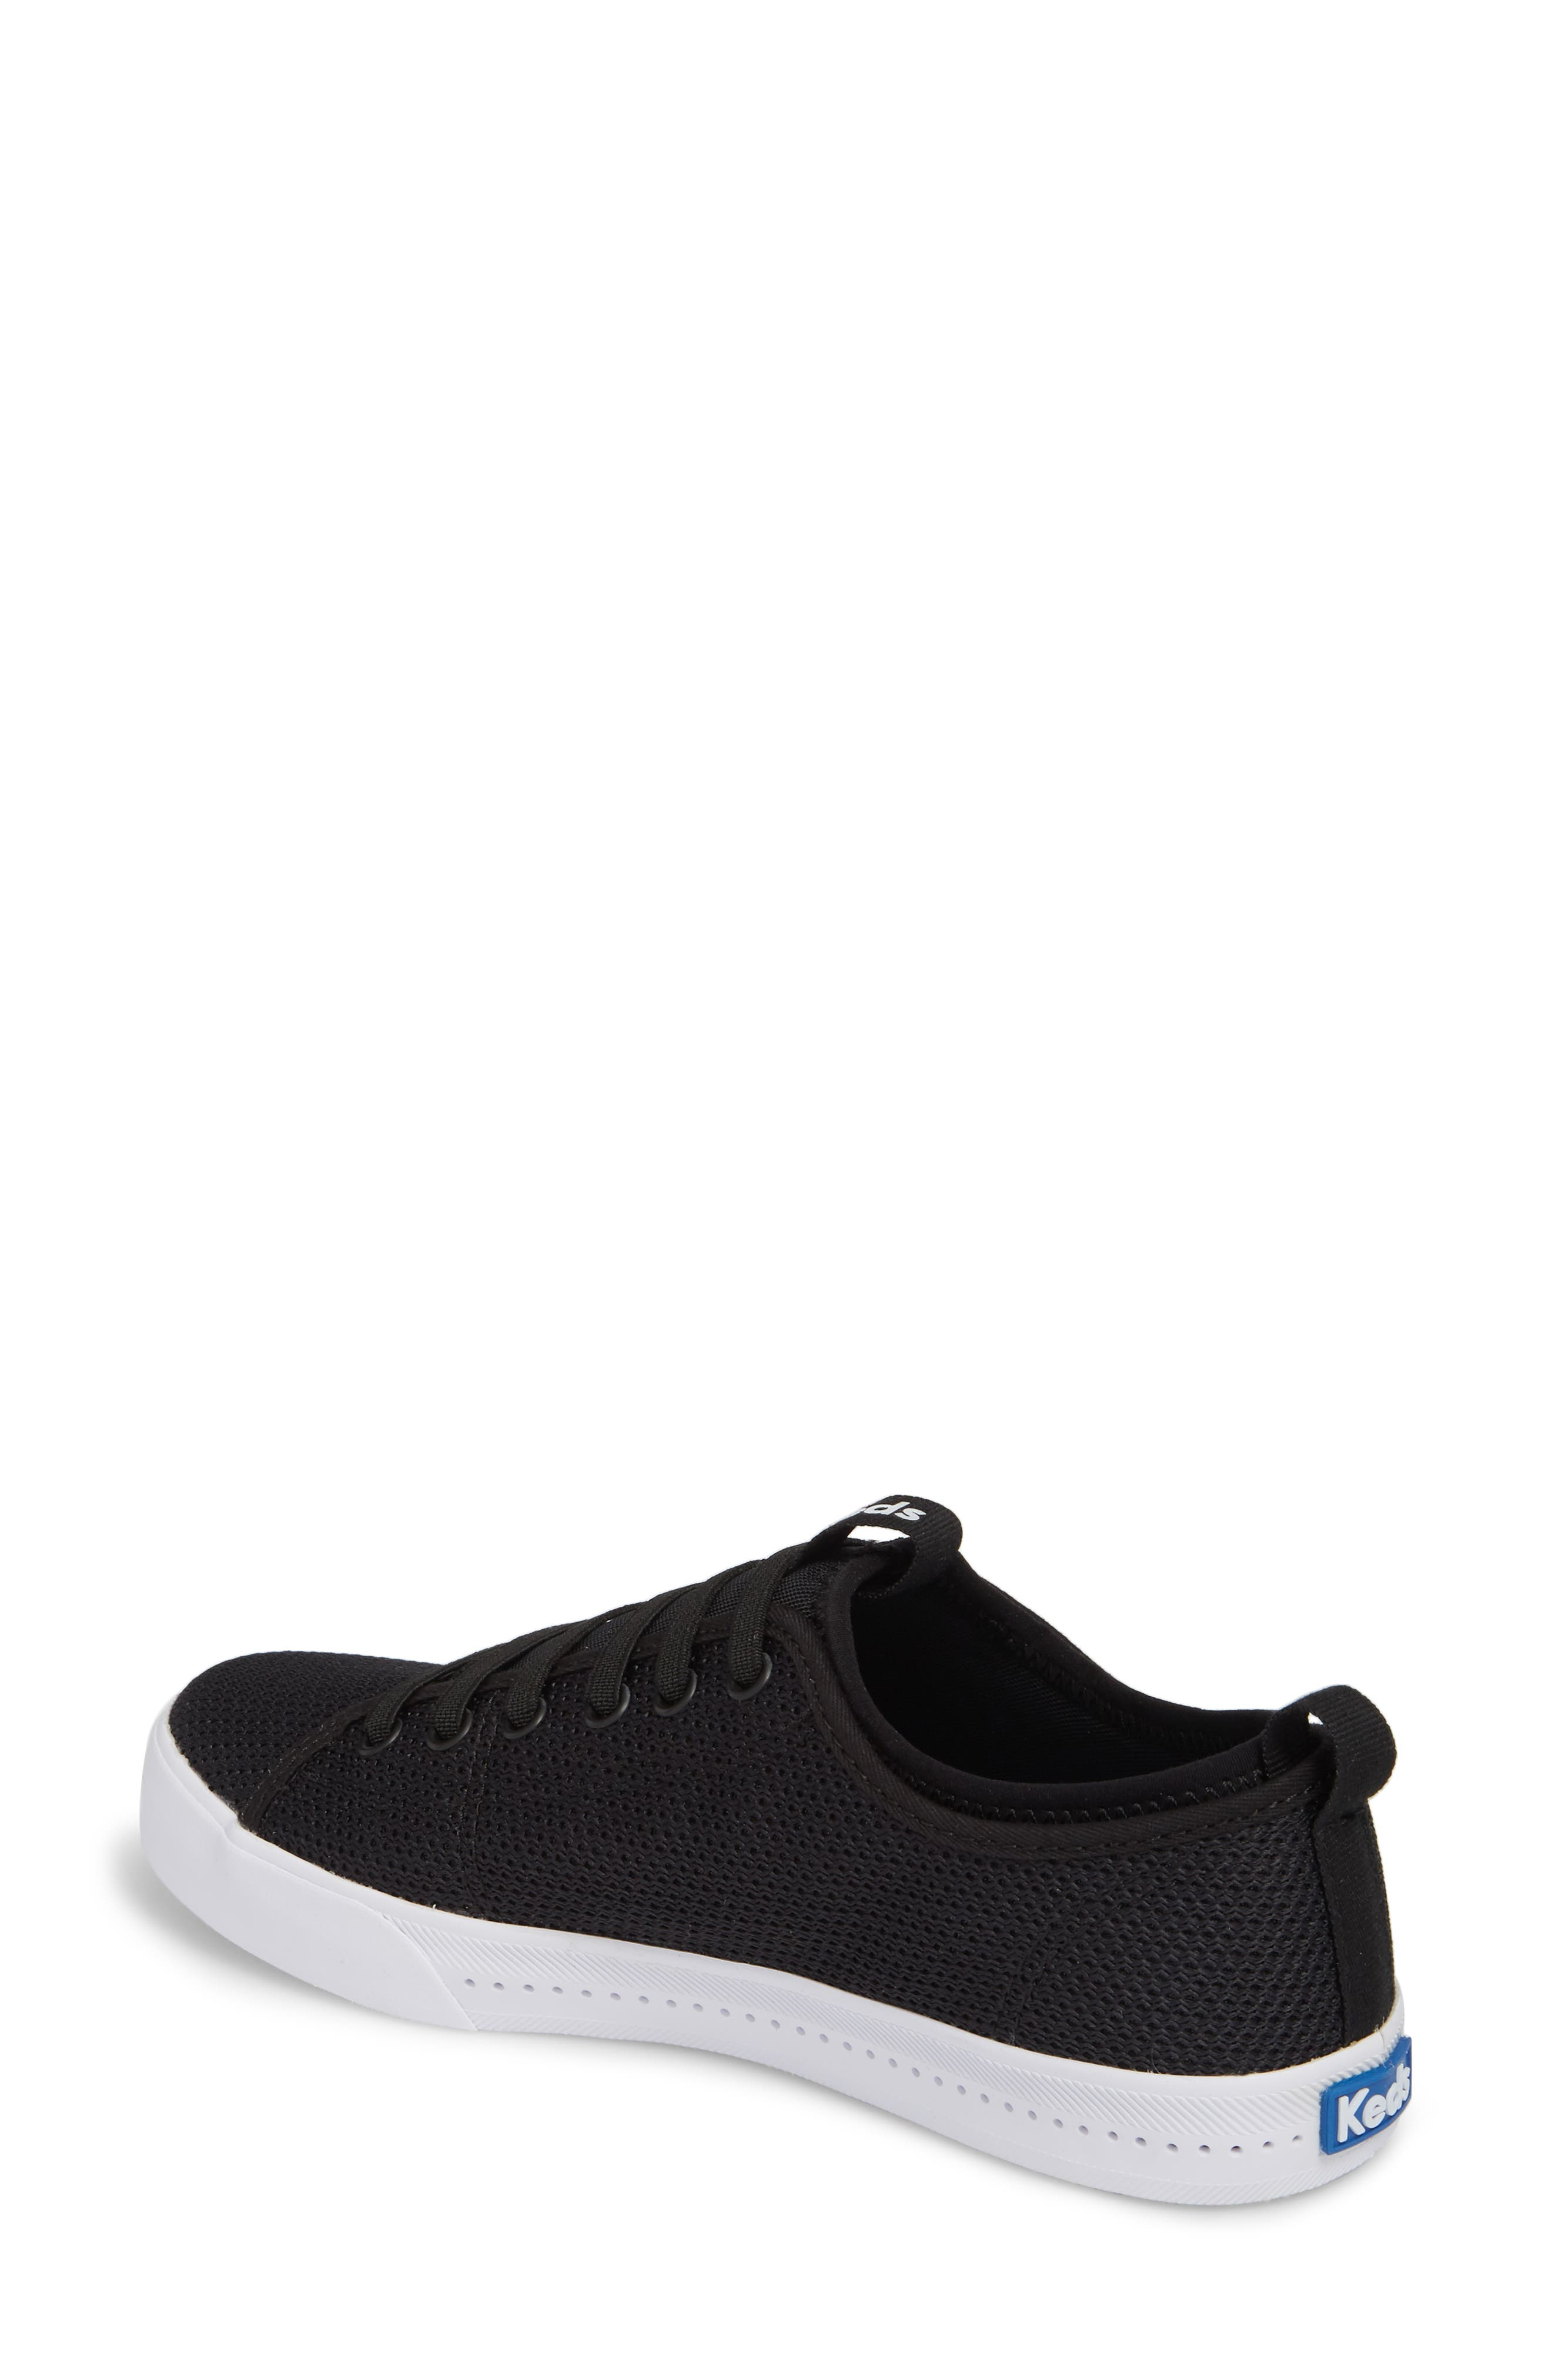 Driftkick Heathered Mesh Sneaker,                             Alternate thumbnail 2, color,                             Black